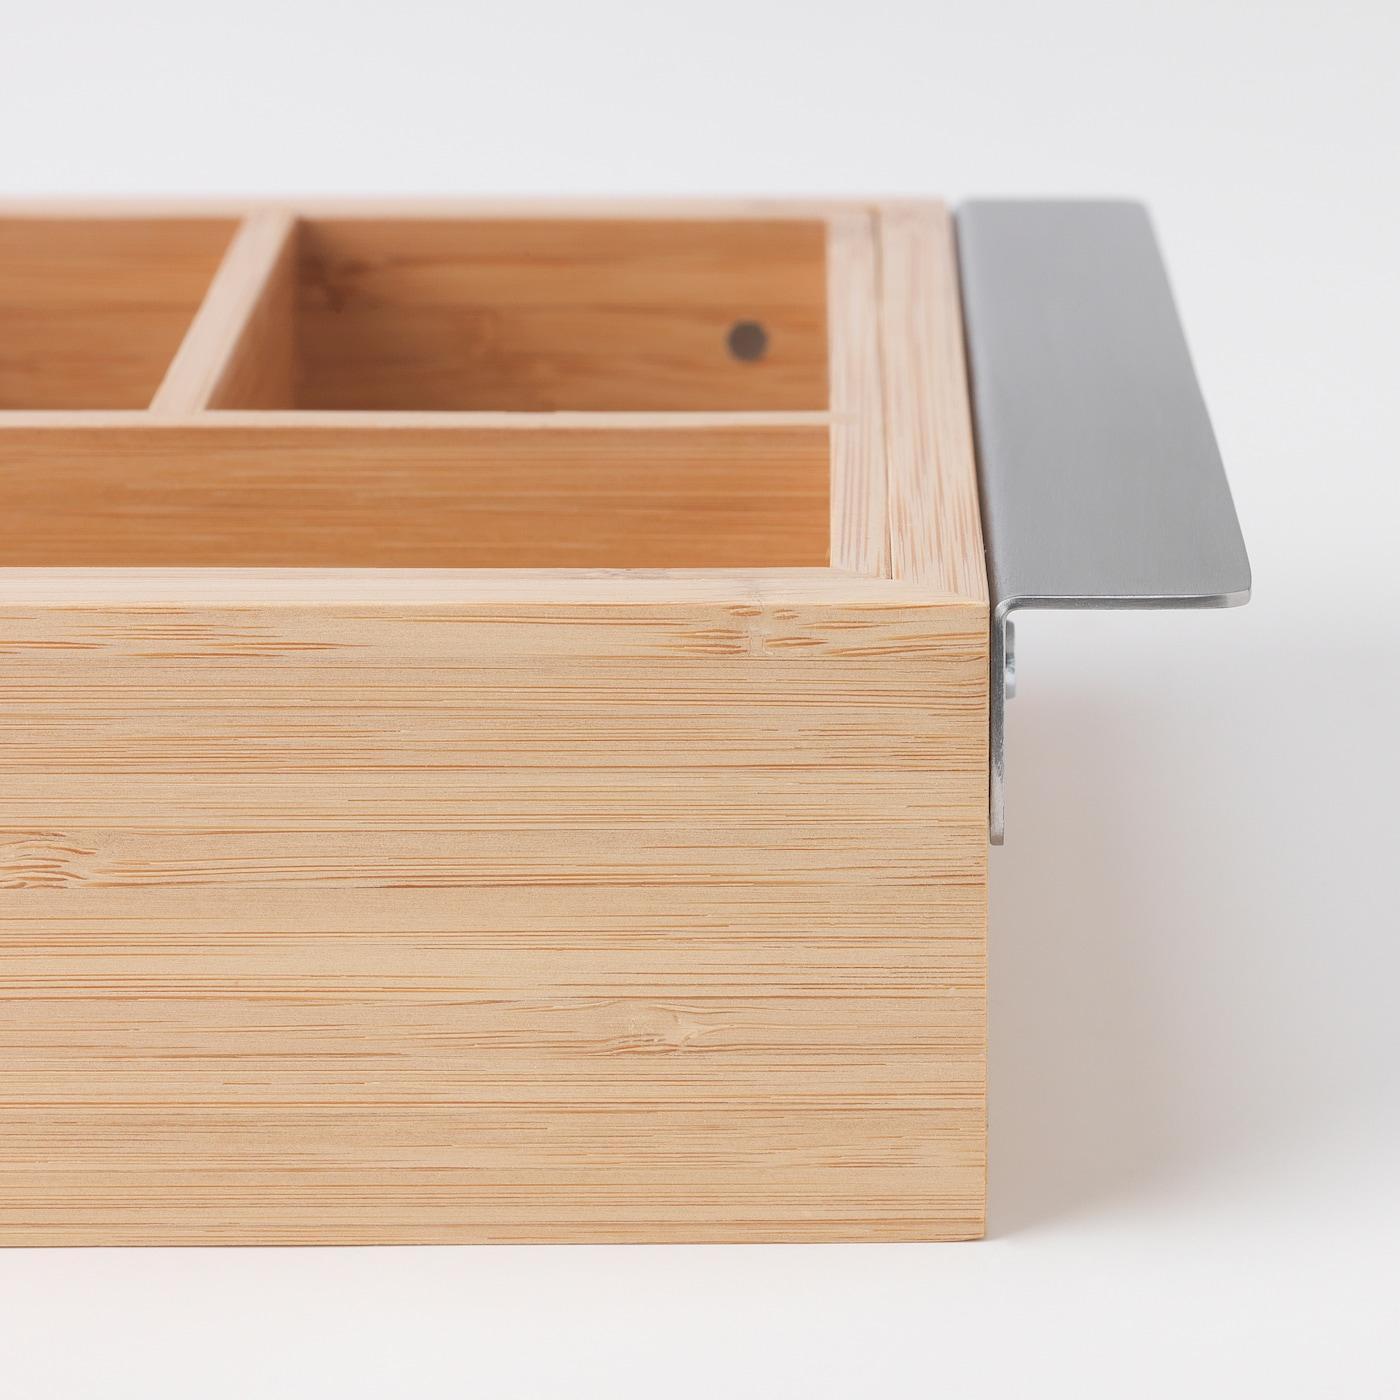 DRAGAN Caja extensible bambú 35 51x21 cm